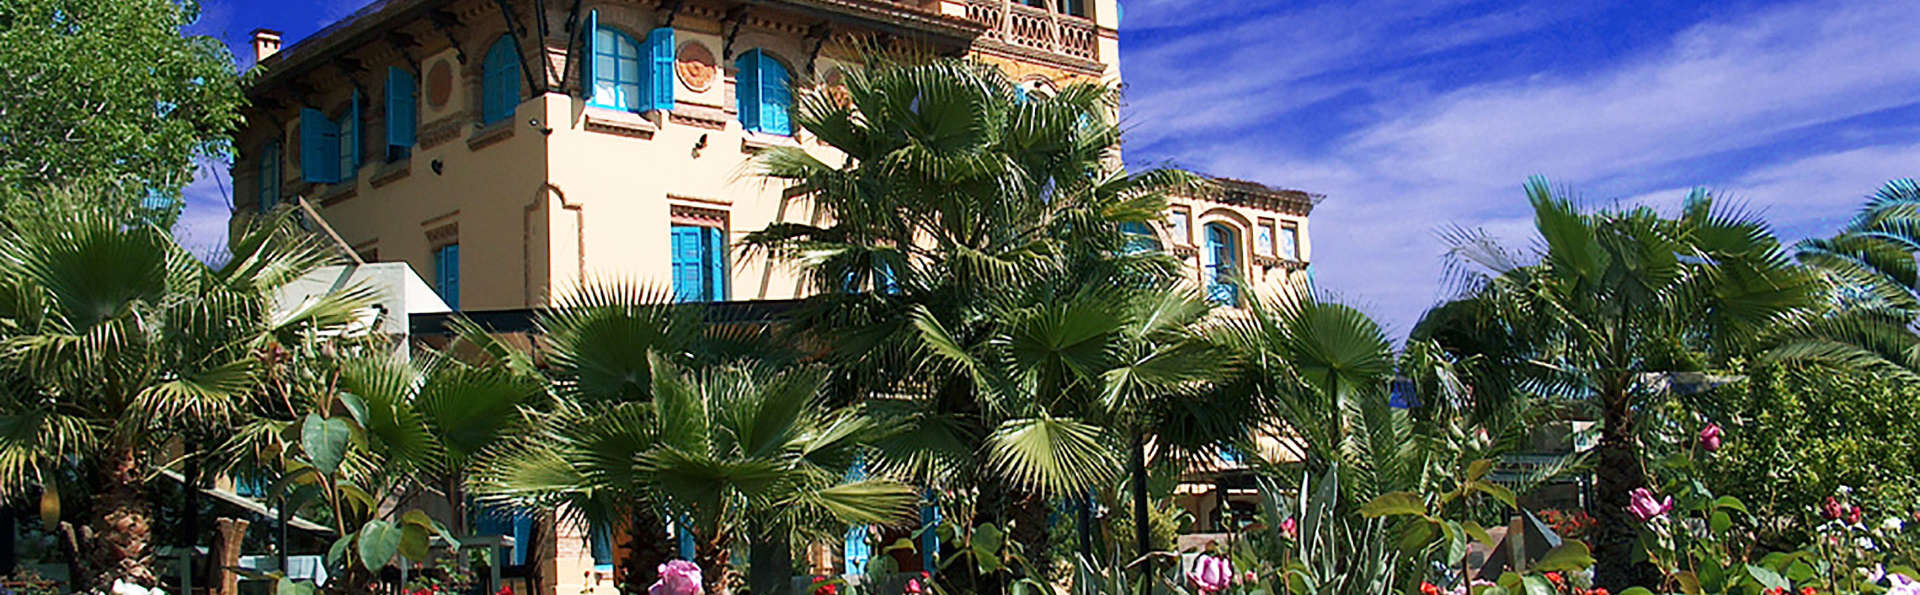 Hotel Monument Mas Passamaner - EDIT_front2.jpg